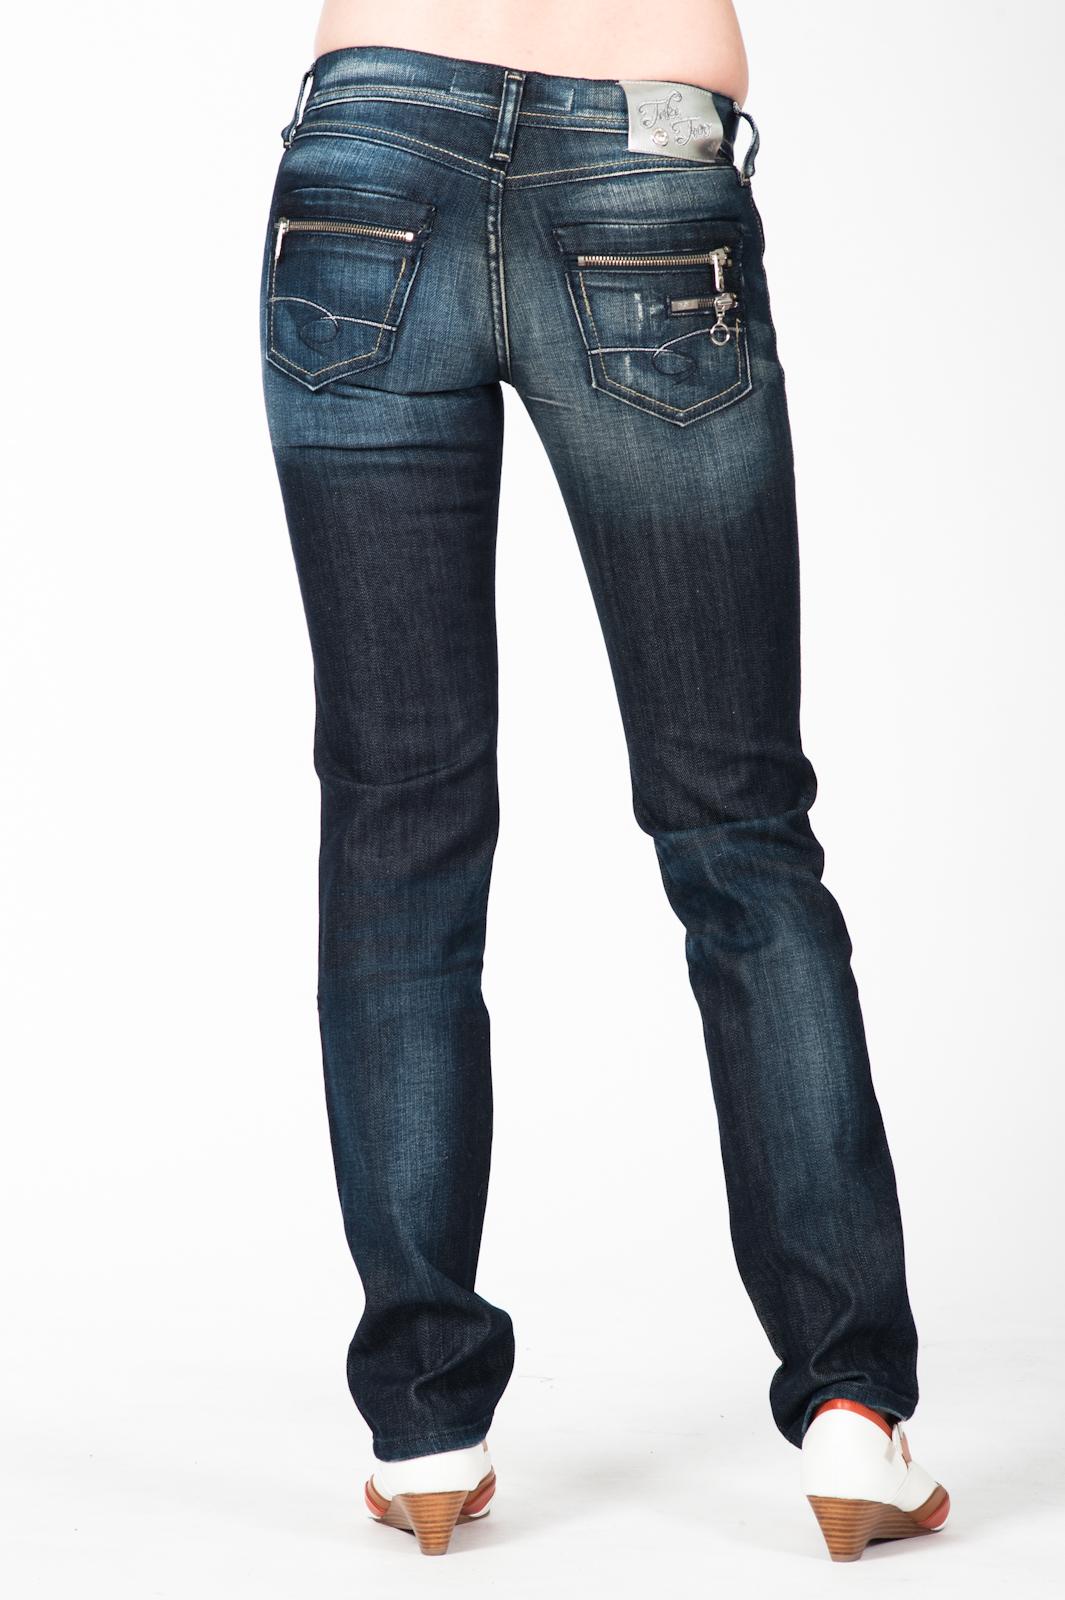 take two damenjeans mod kinsley jeans hose girls blau neu. Black Bedroom Furniture Sets. Home Design Ideas